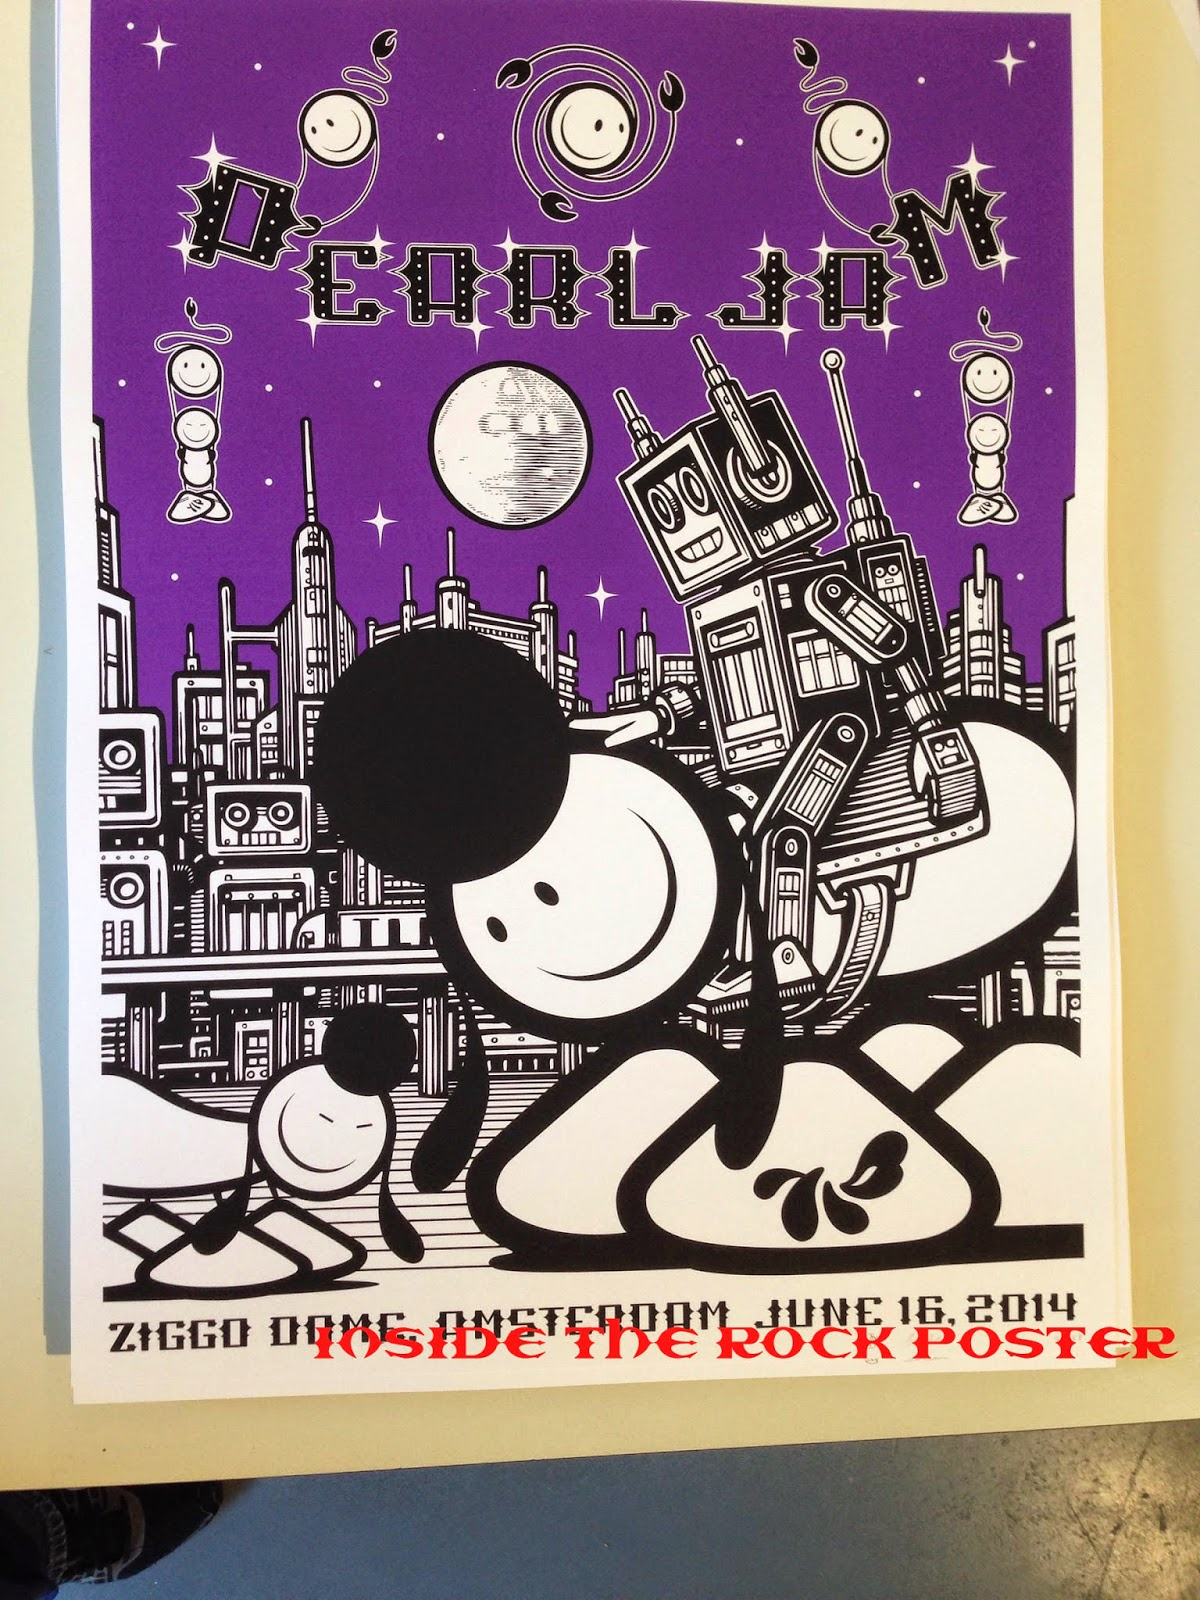 Inside The Rock Poster Frame Blog Pearl Jam Amsterdam Sit